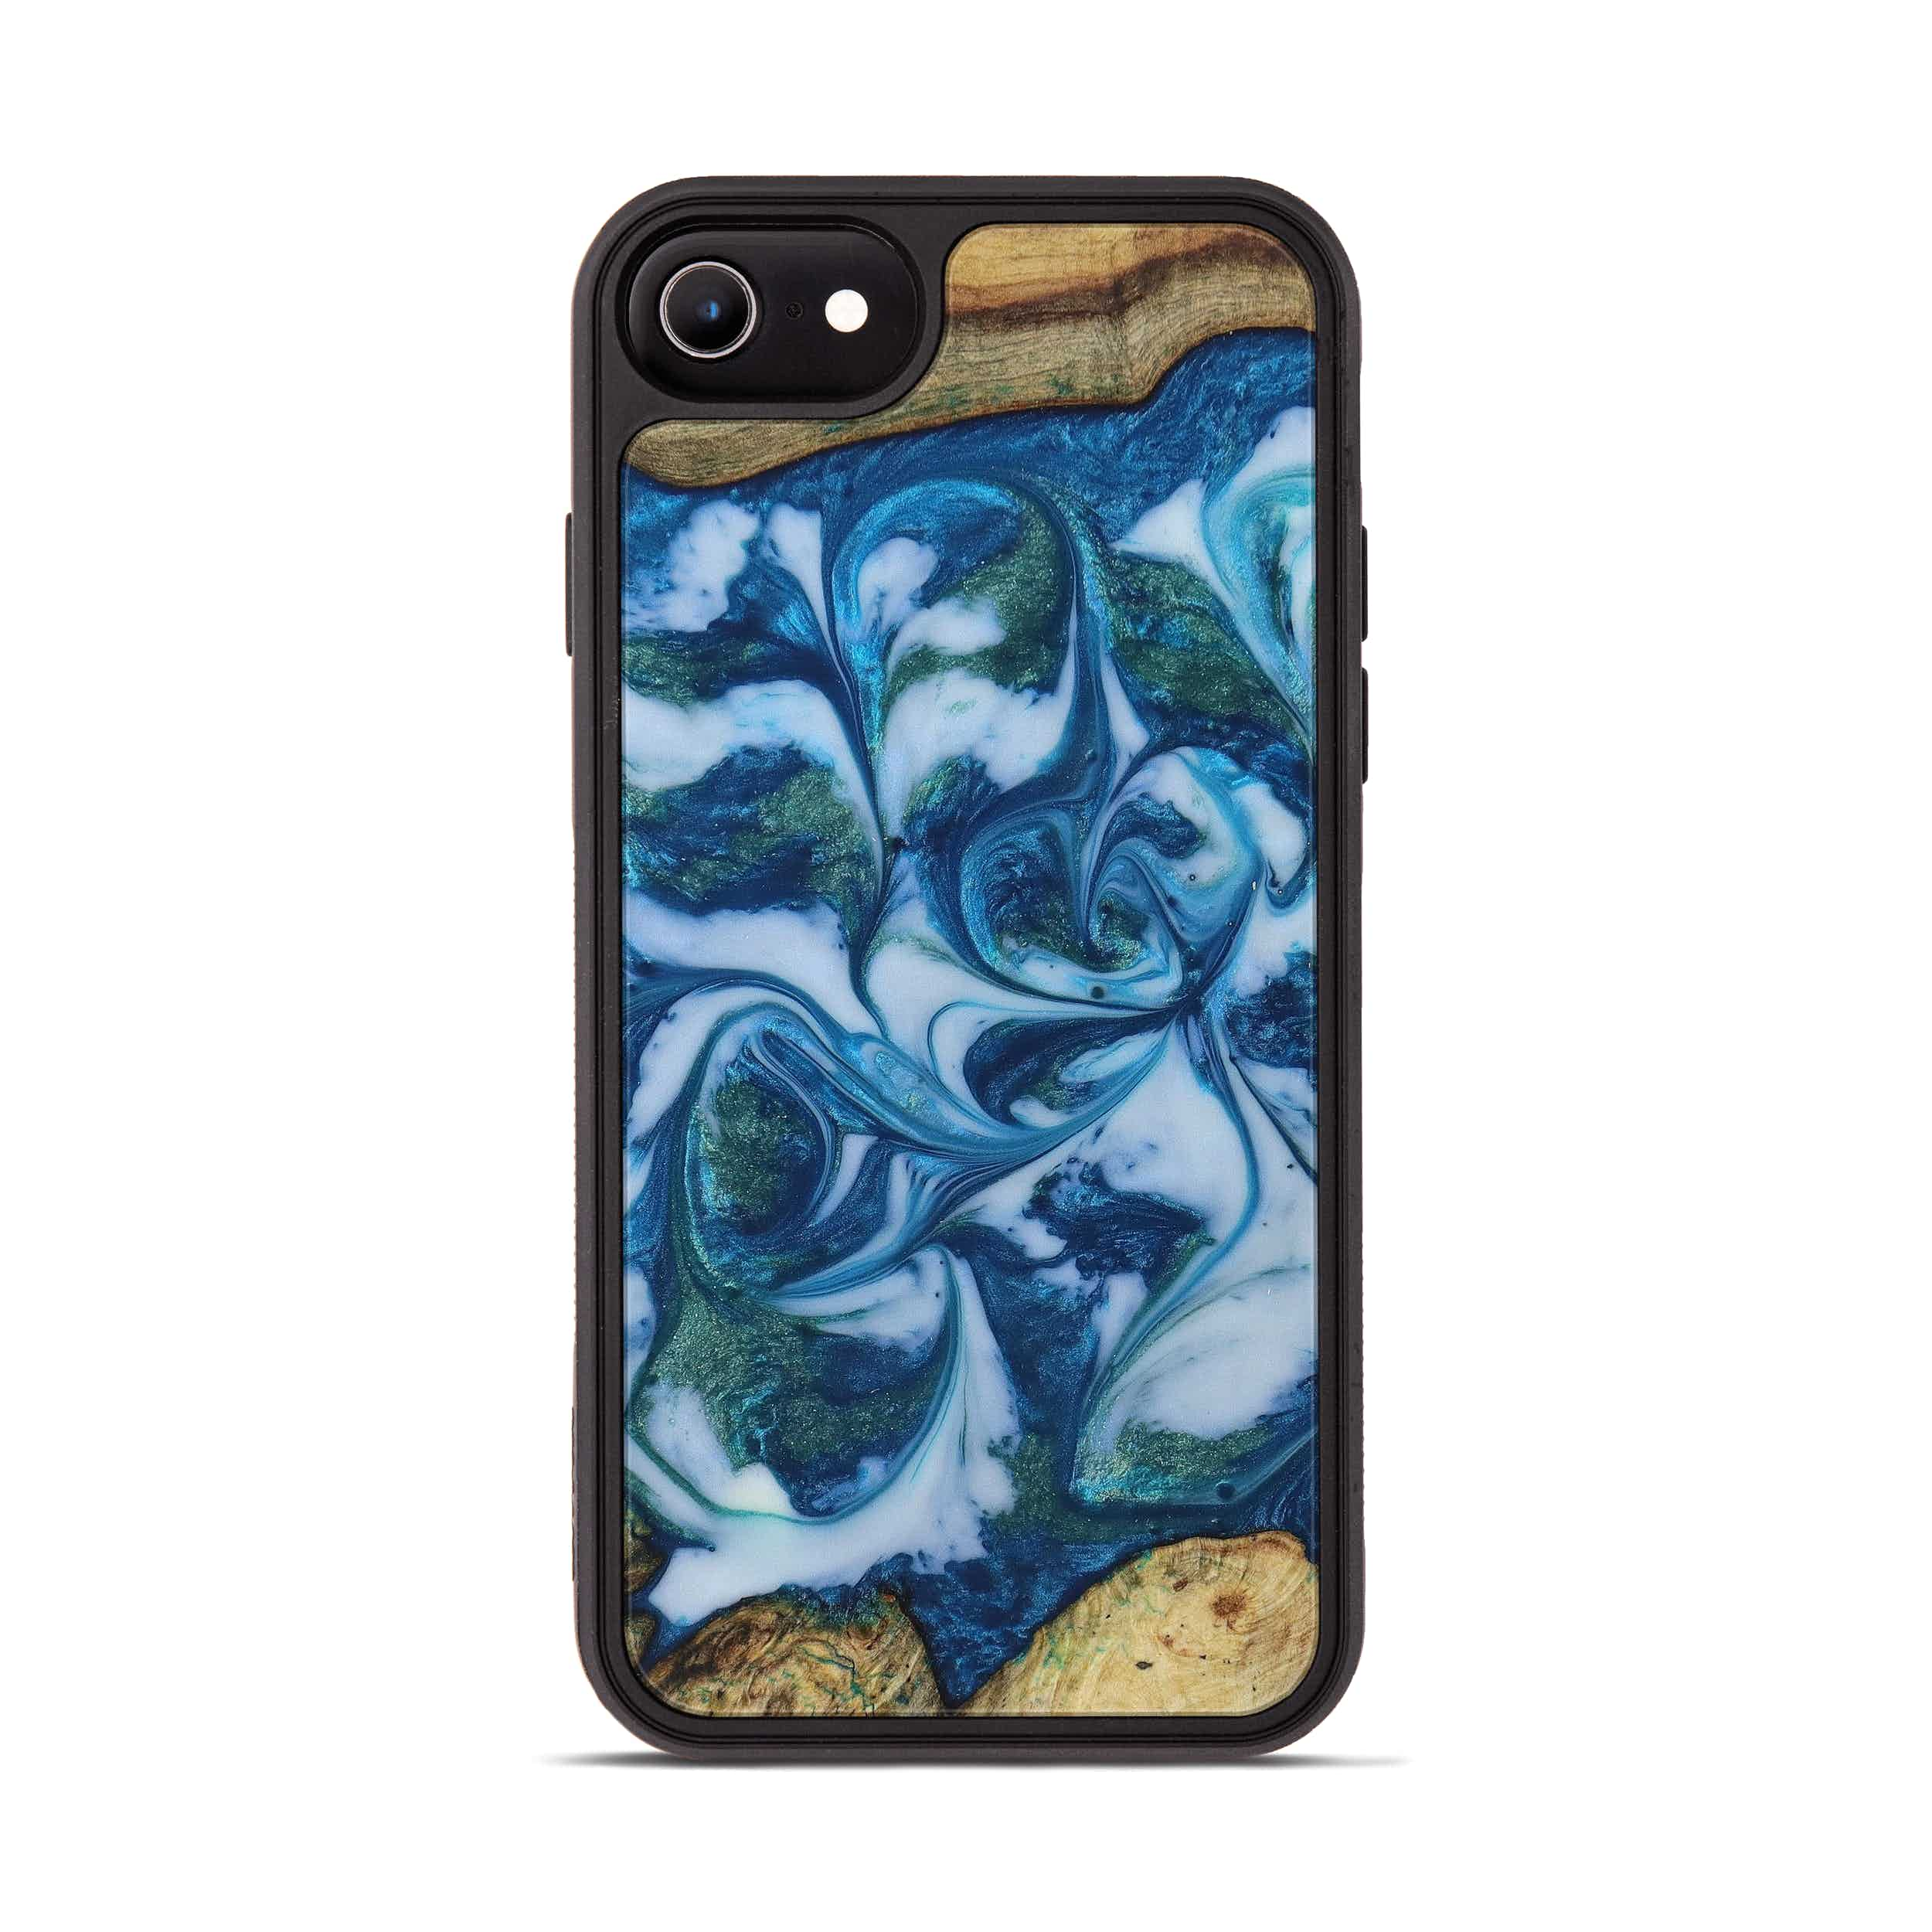 iPhone 6s Wood+Resin Phone Case - Maurijn (Light Blue, 394829)